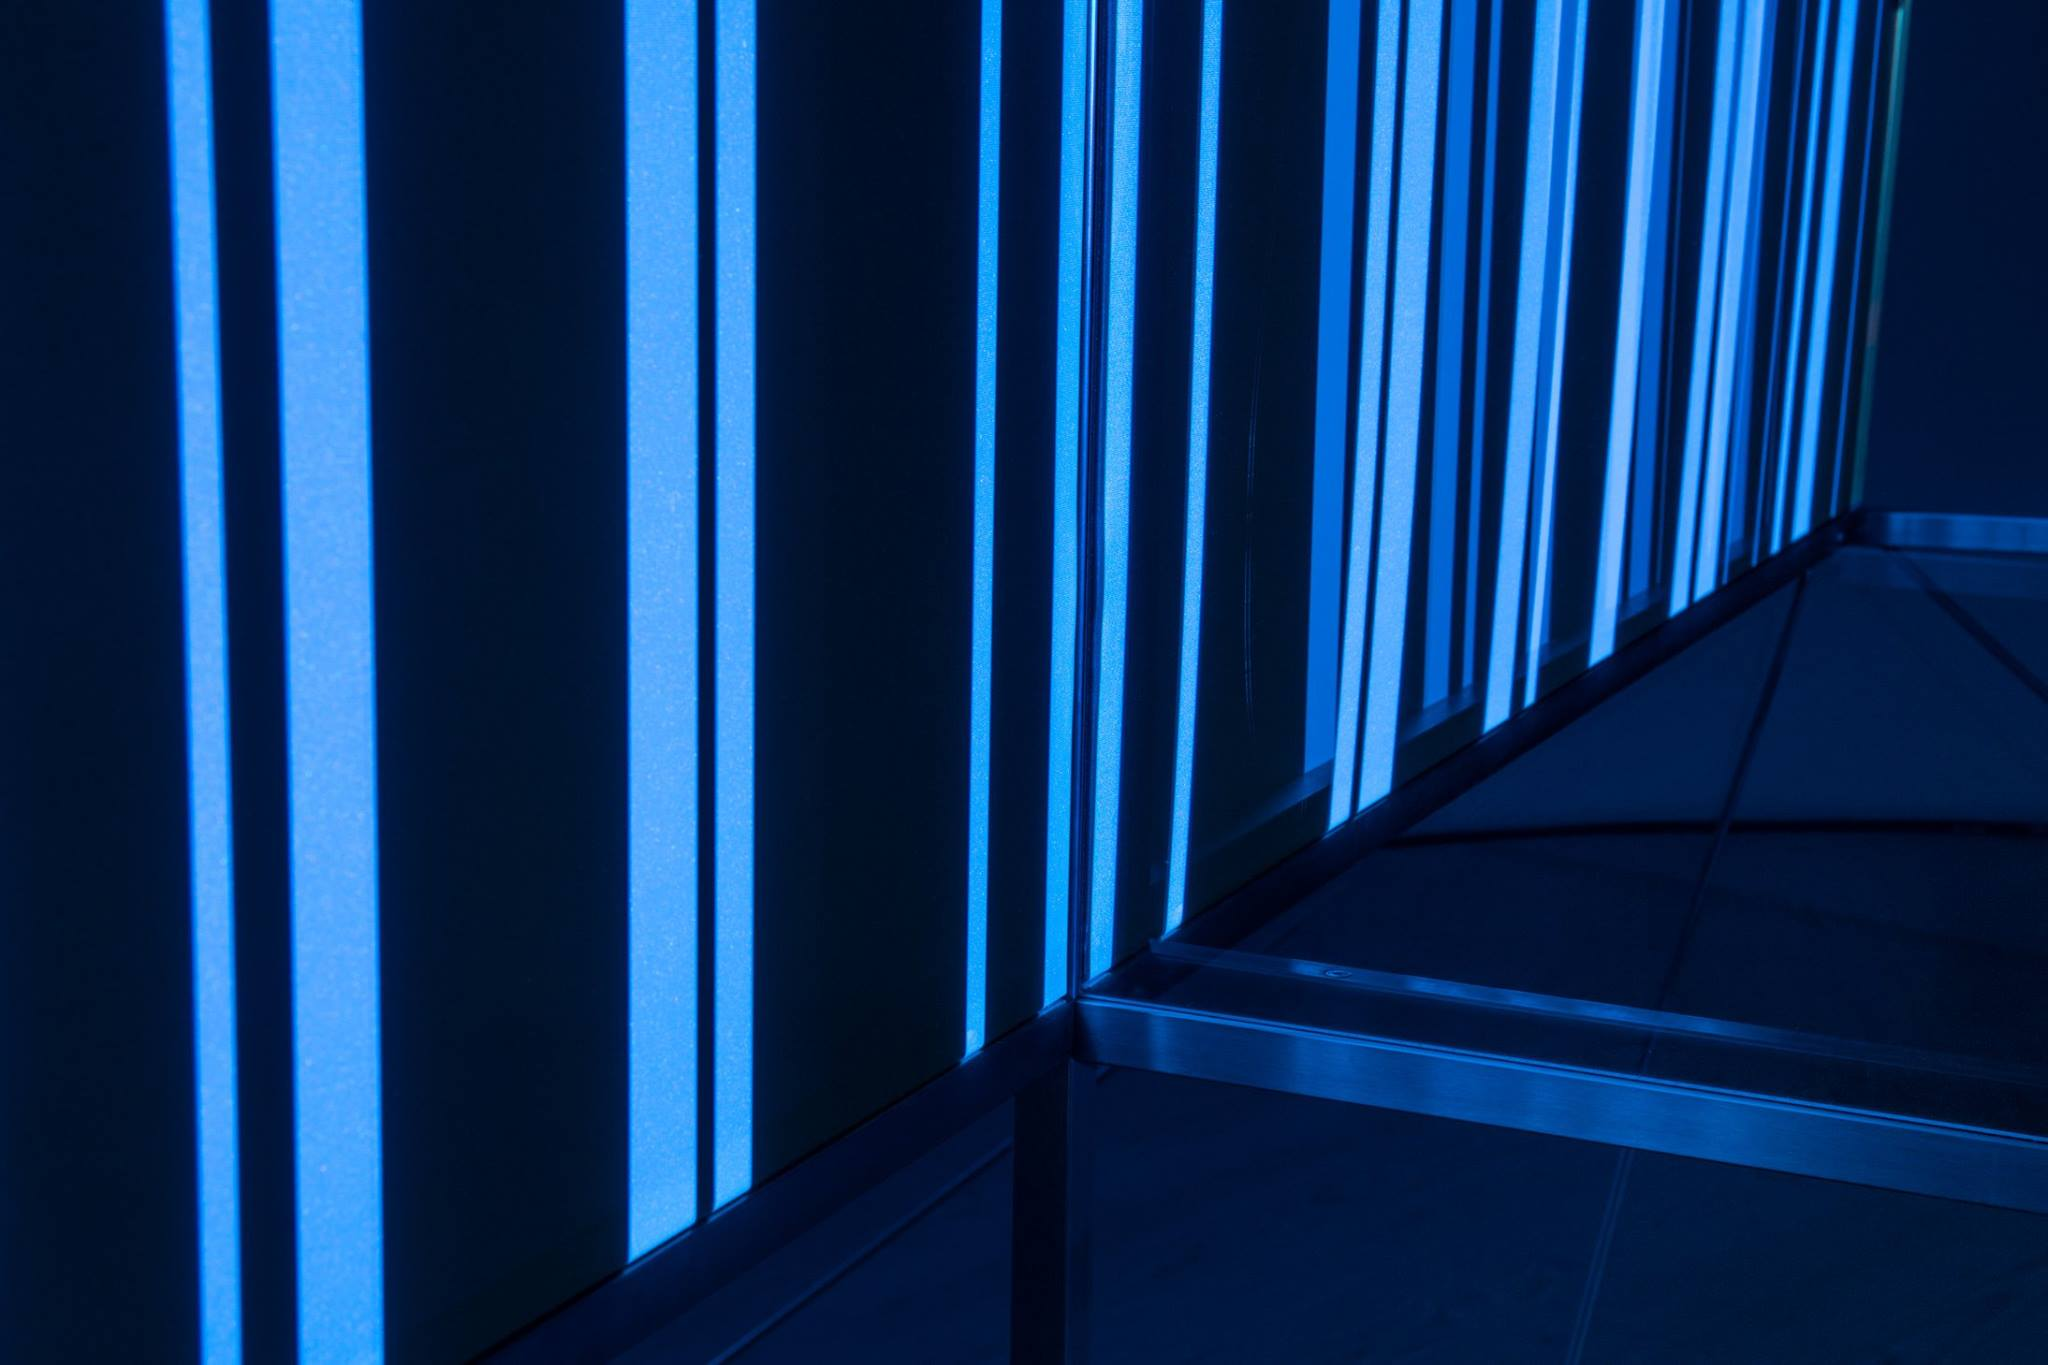 Continuum-Kite-Saatchi-01.jpg